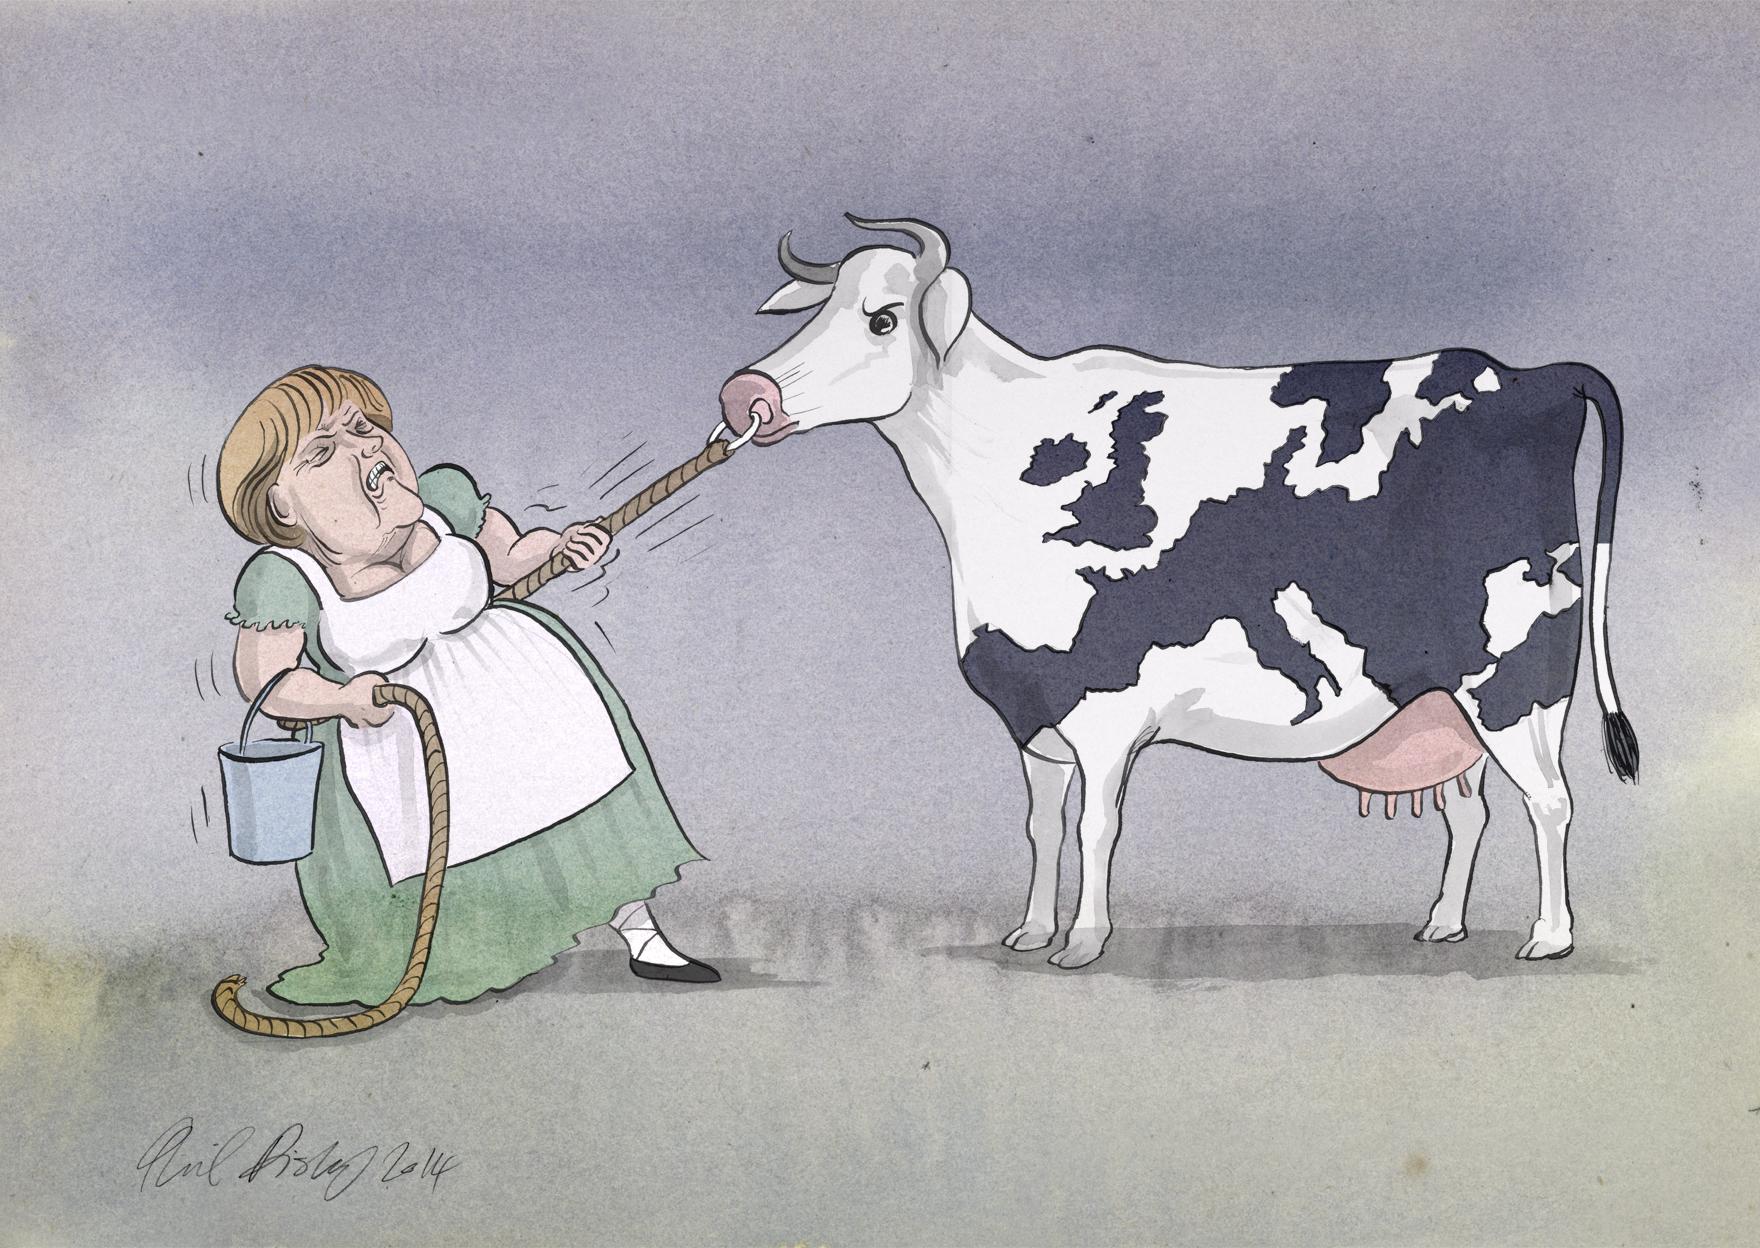 Phil Disley / Milkmaid / The Guardian